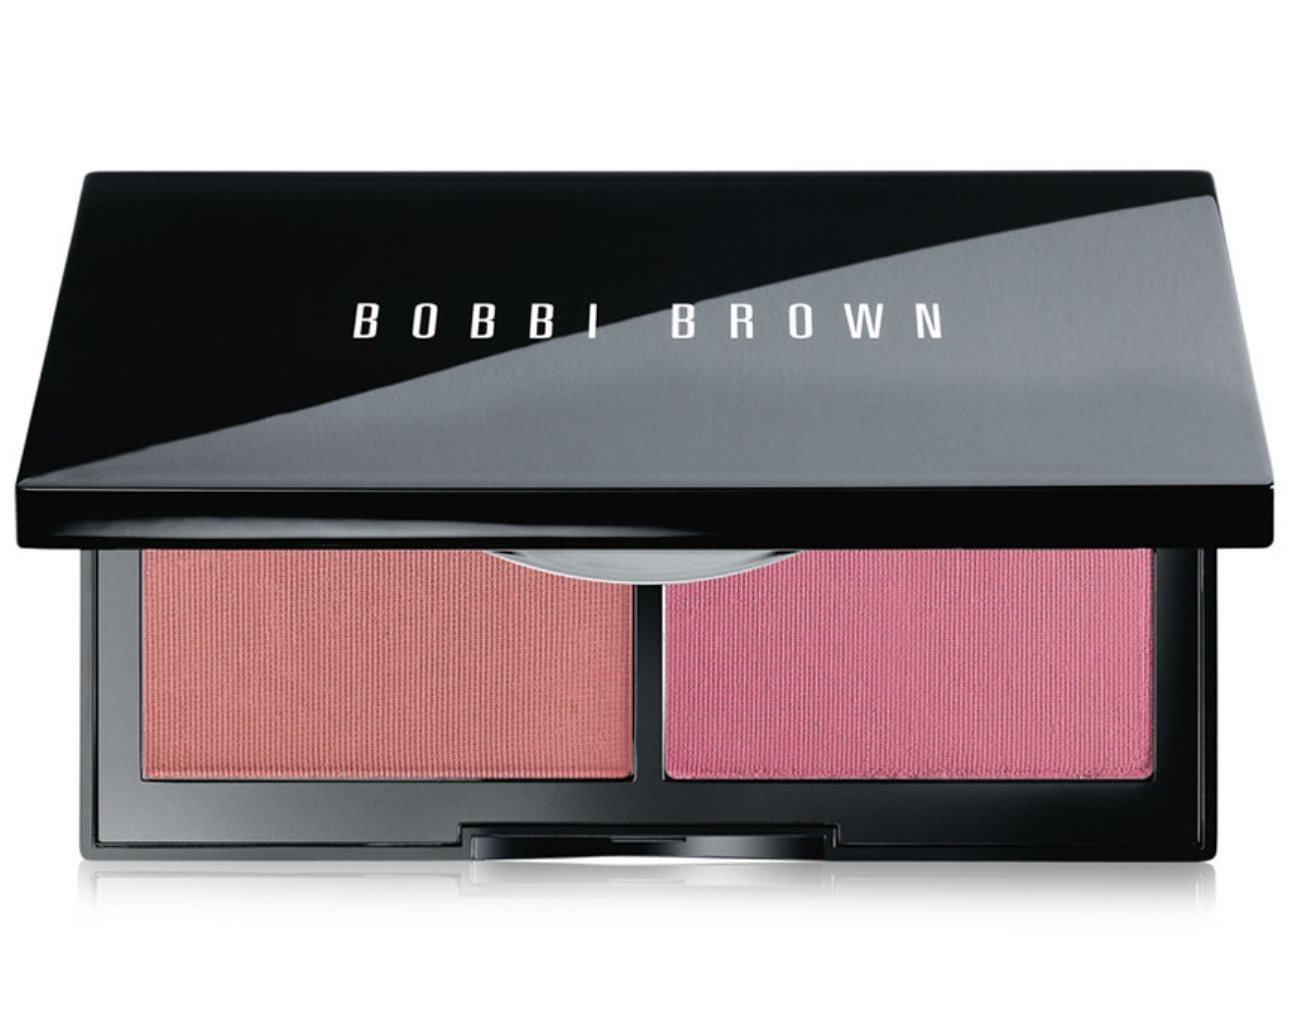 Bobbi Brown Blush Duo - Tawny/Peony by Bobbi Brown (Image #1)